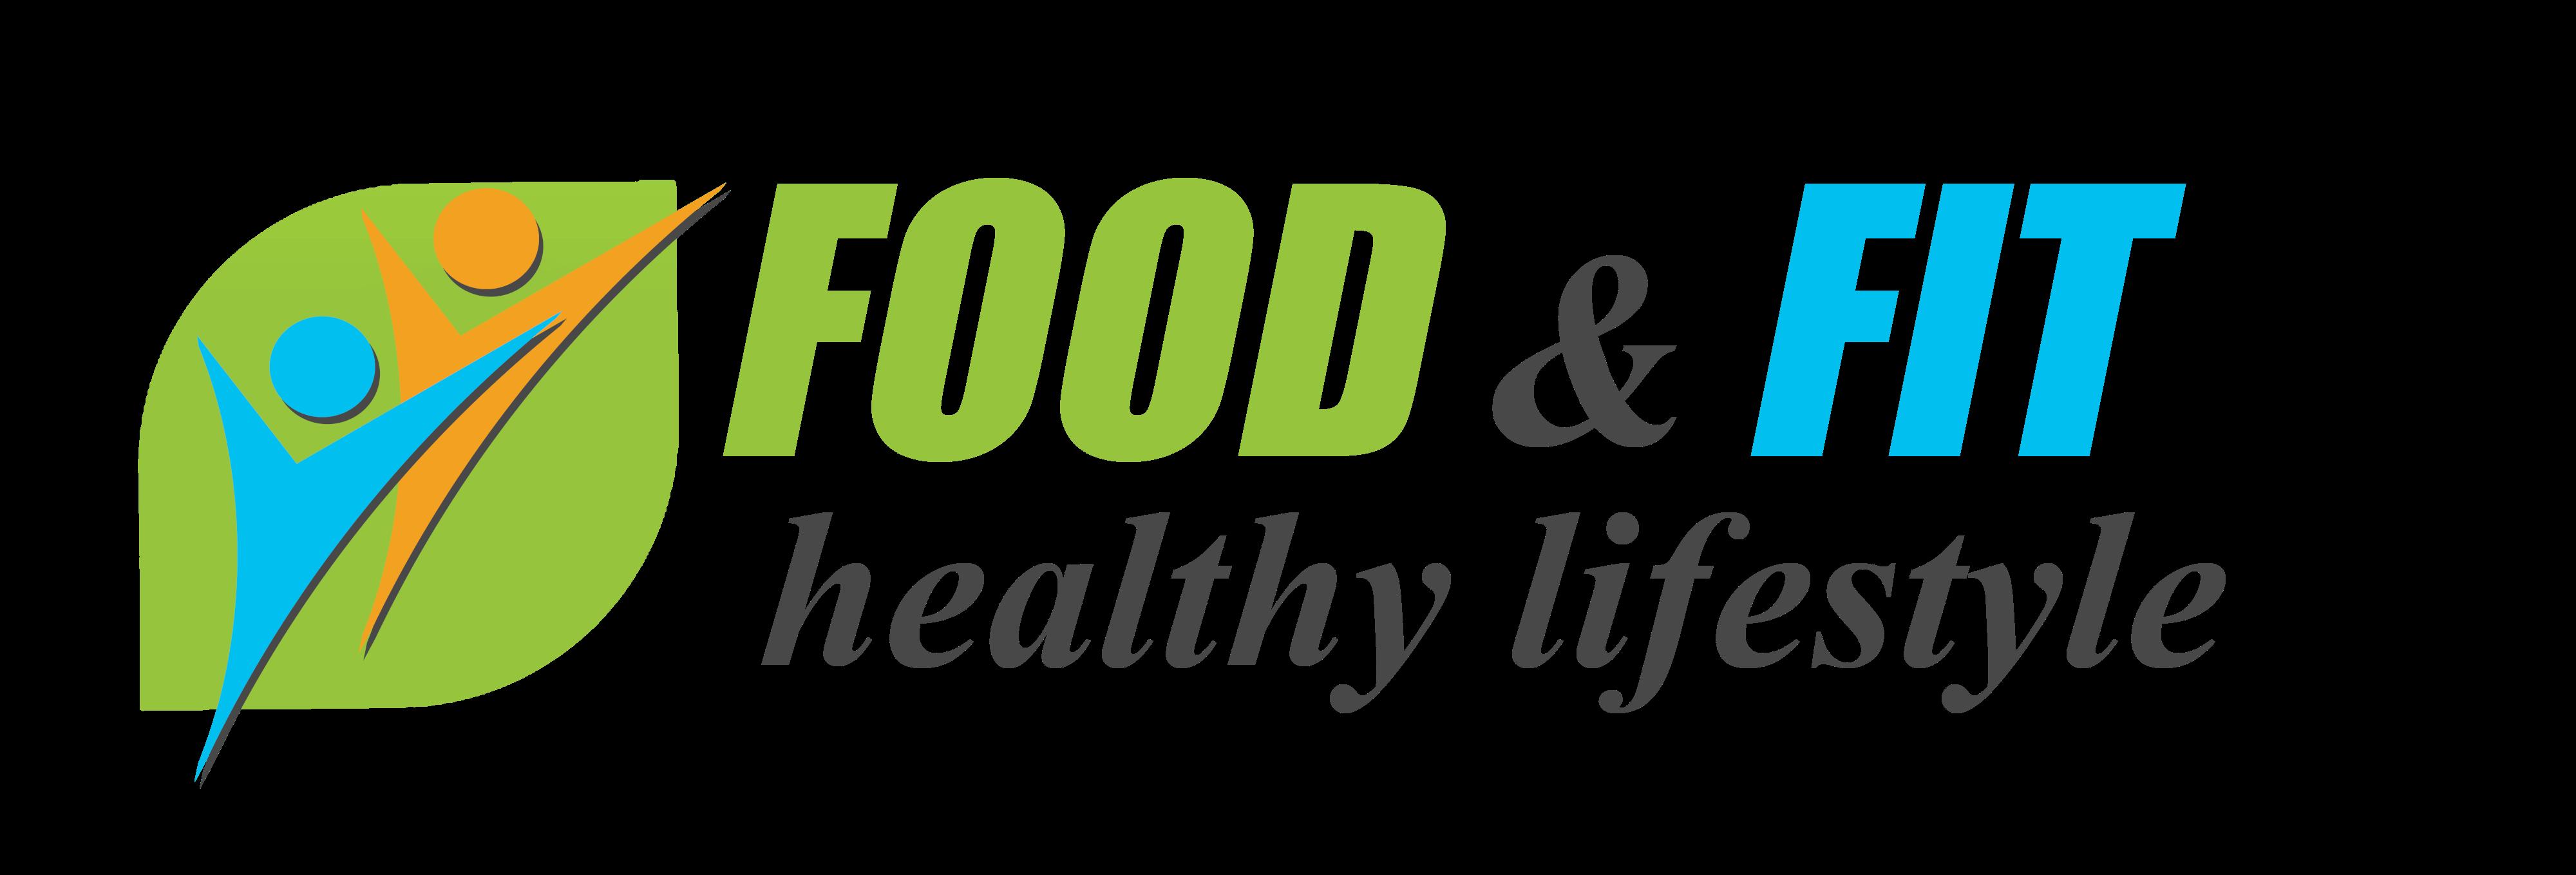 logo ff lifestyle szary